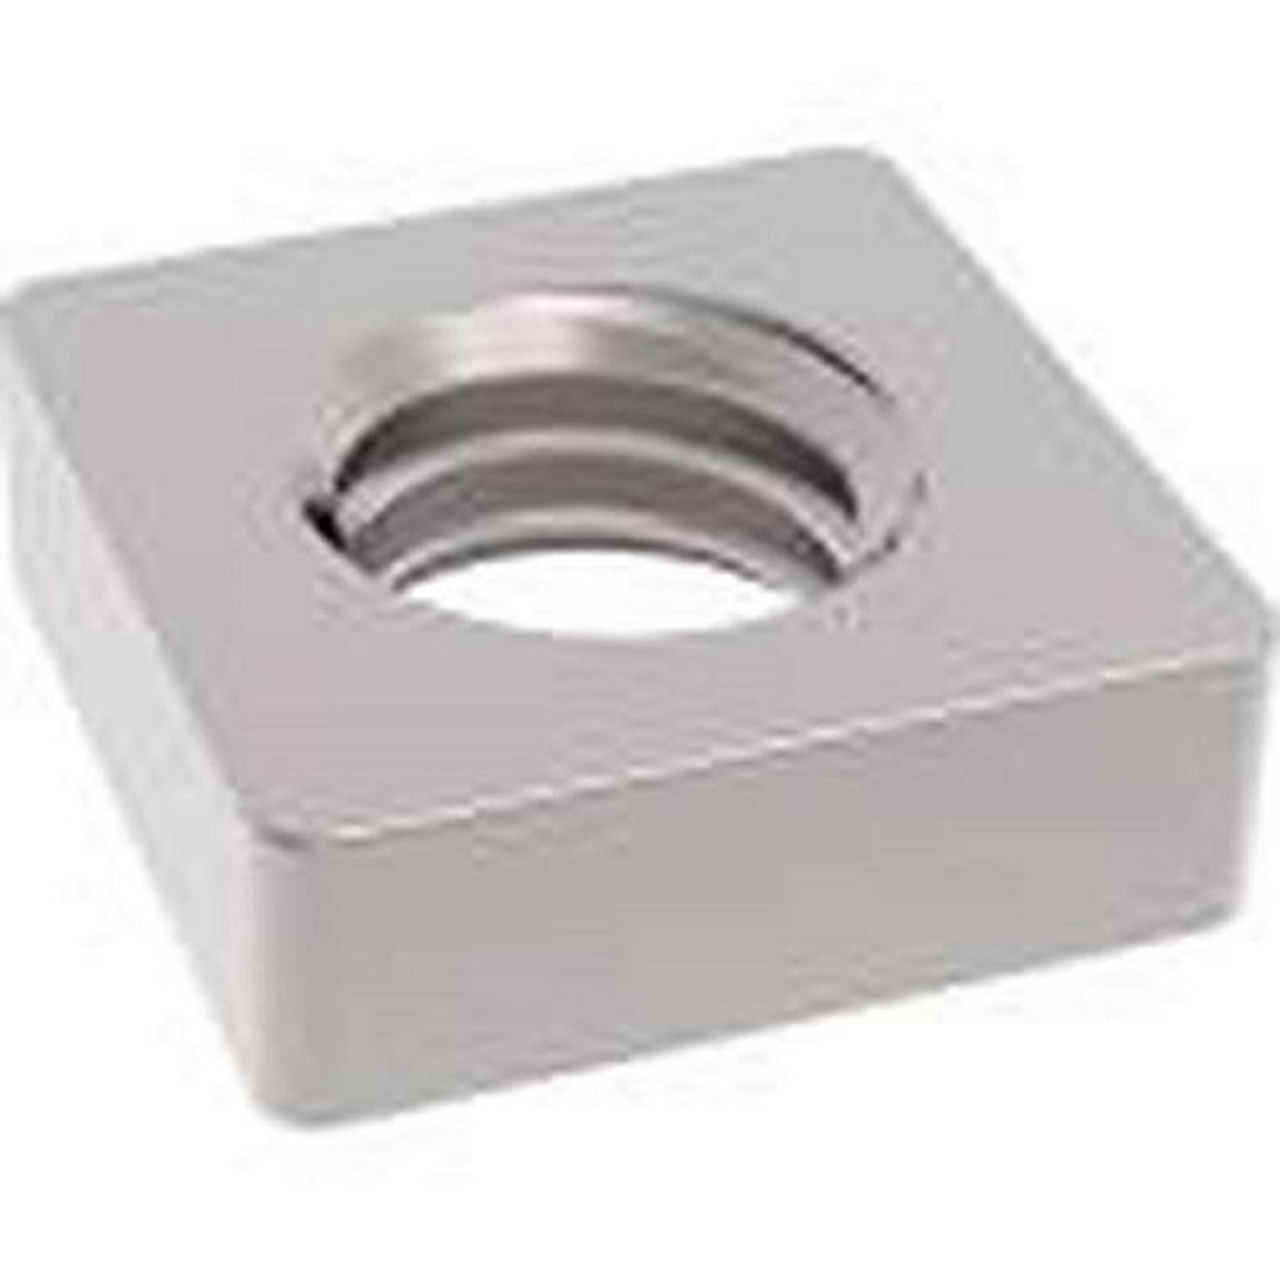 square-nut-79502.1503081007-43520.1562039257.jpg